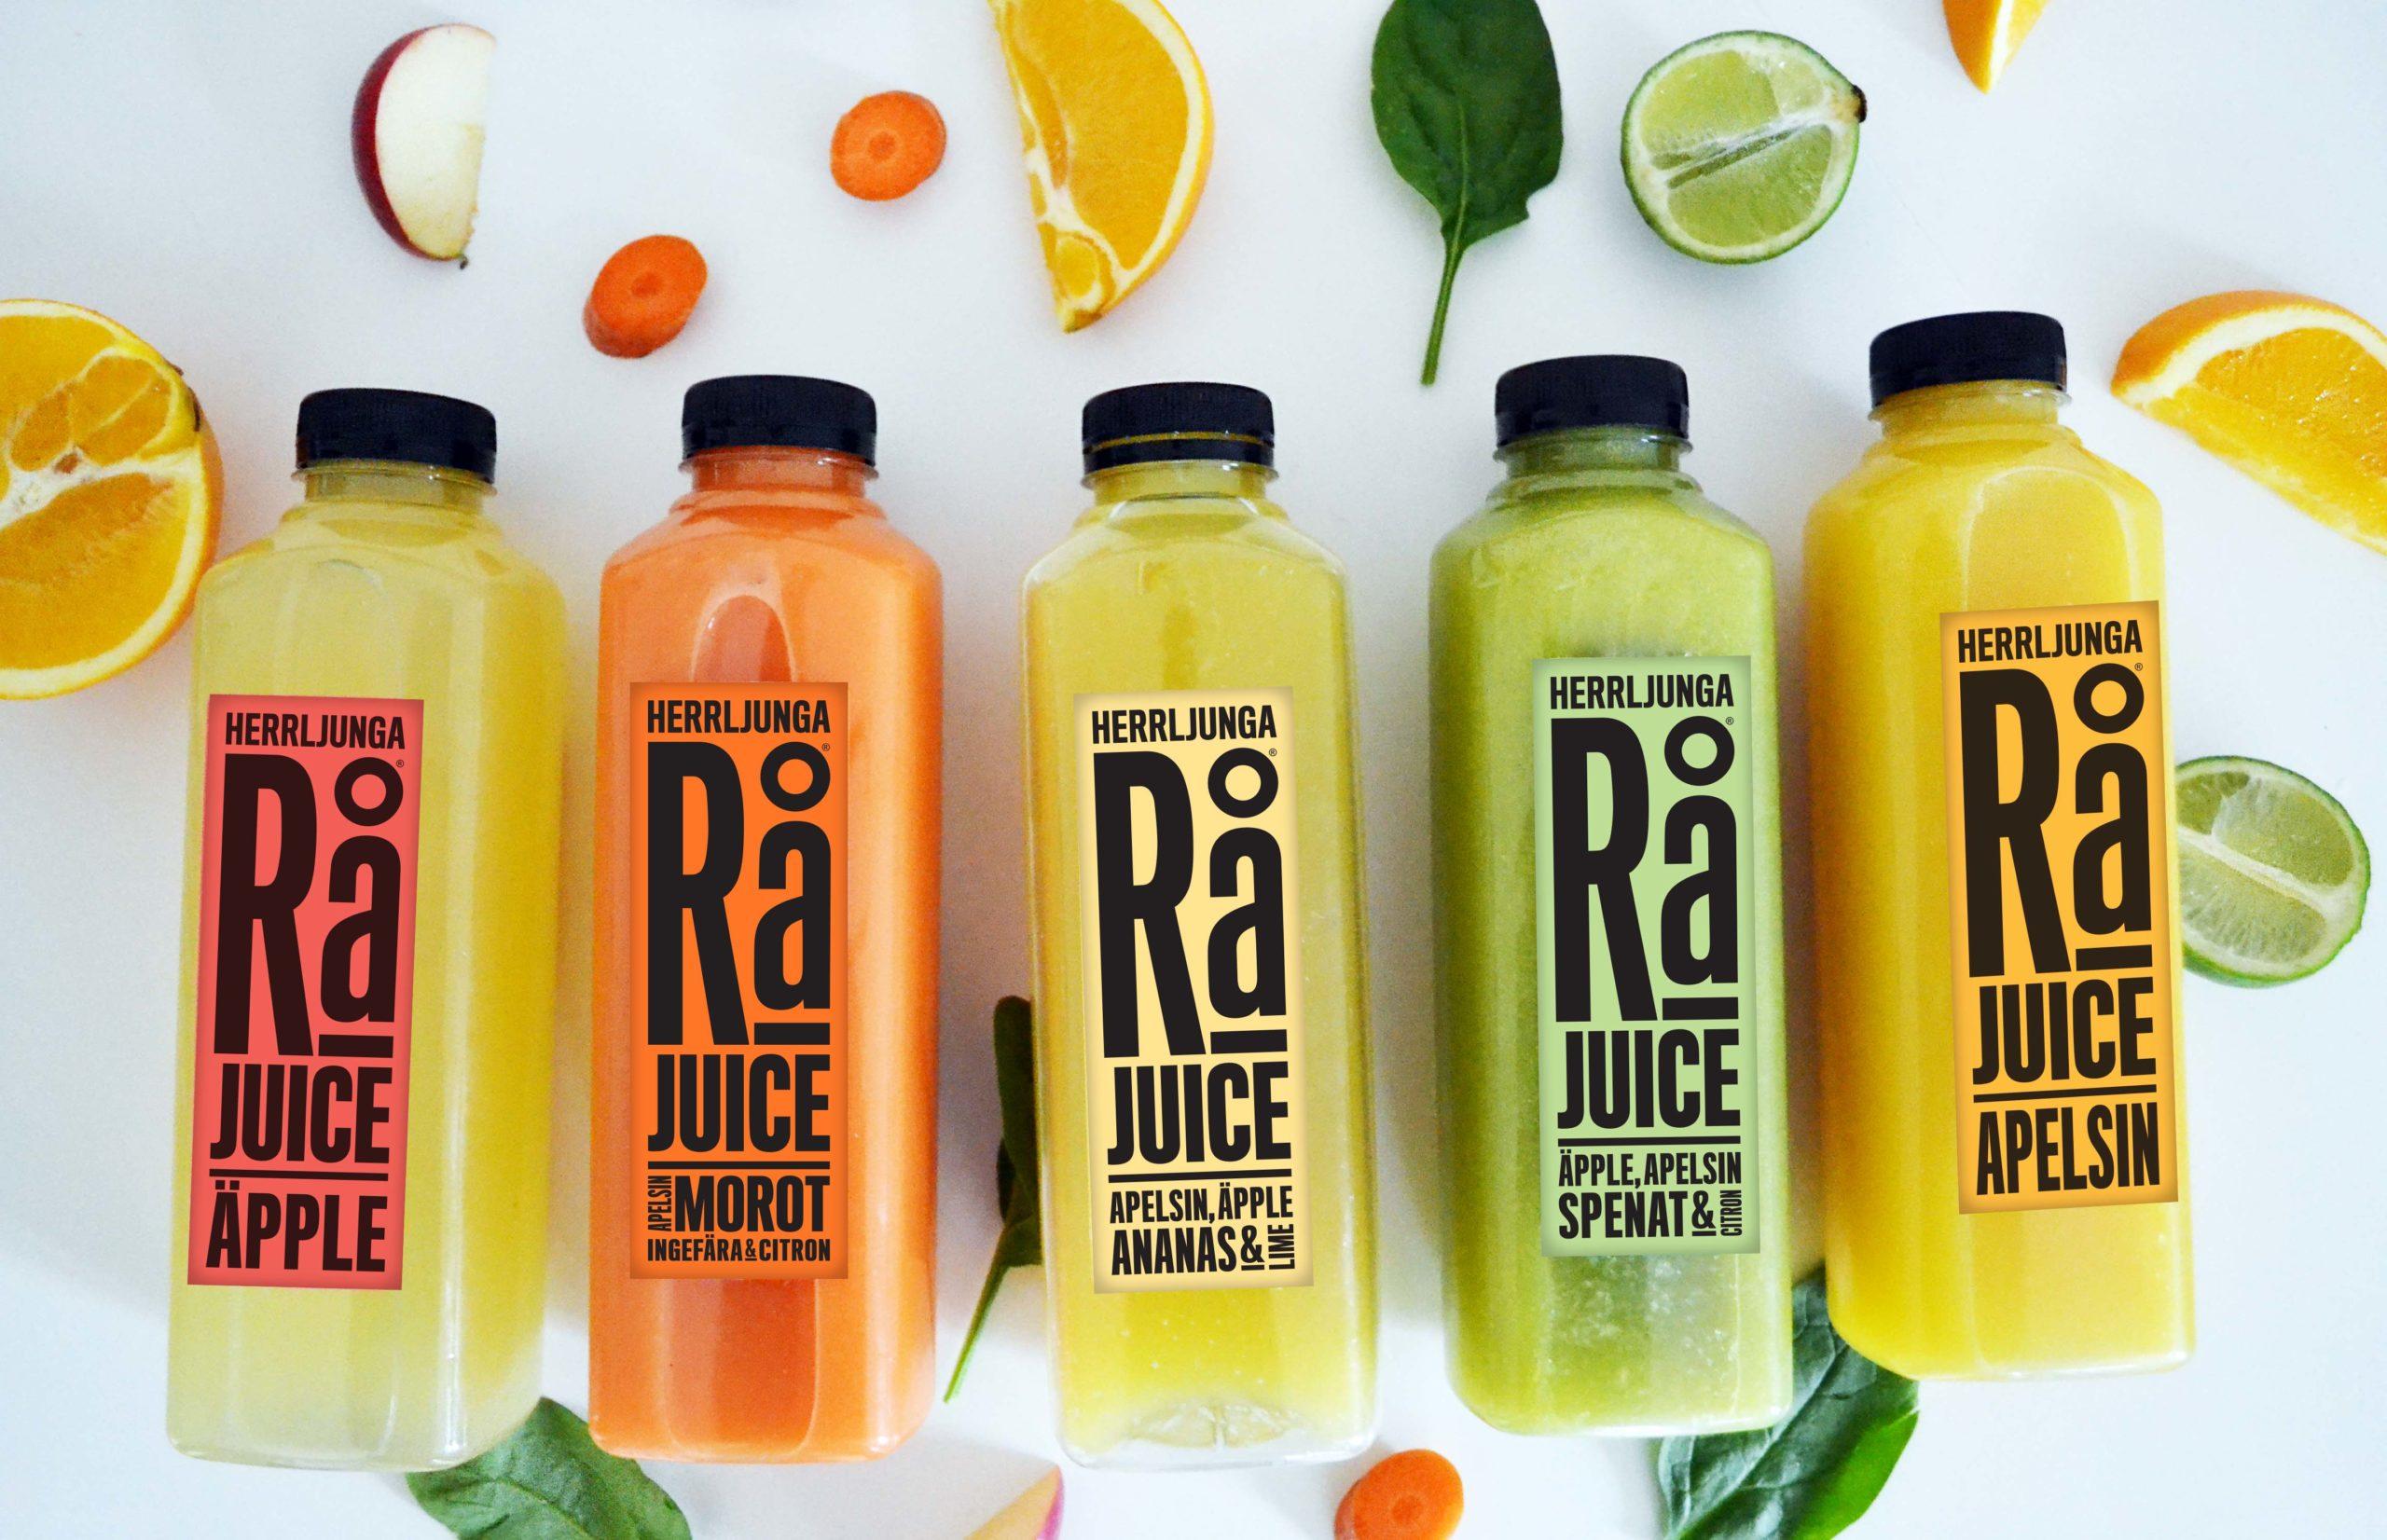 Herrljunga Rå - obehandlad juice